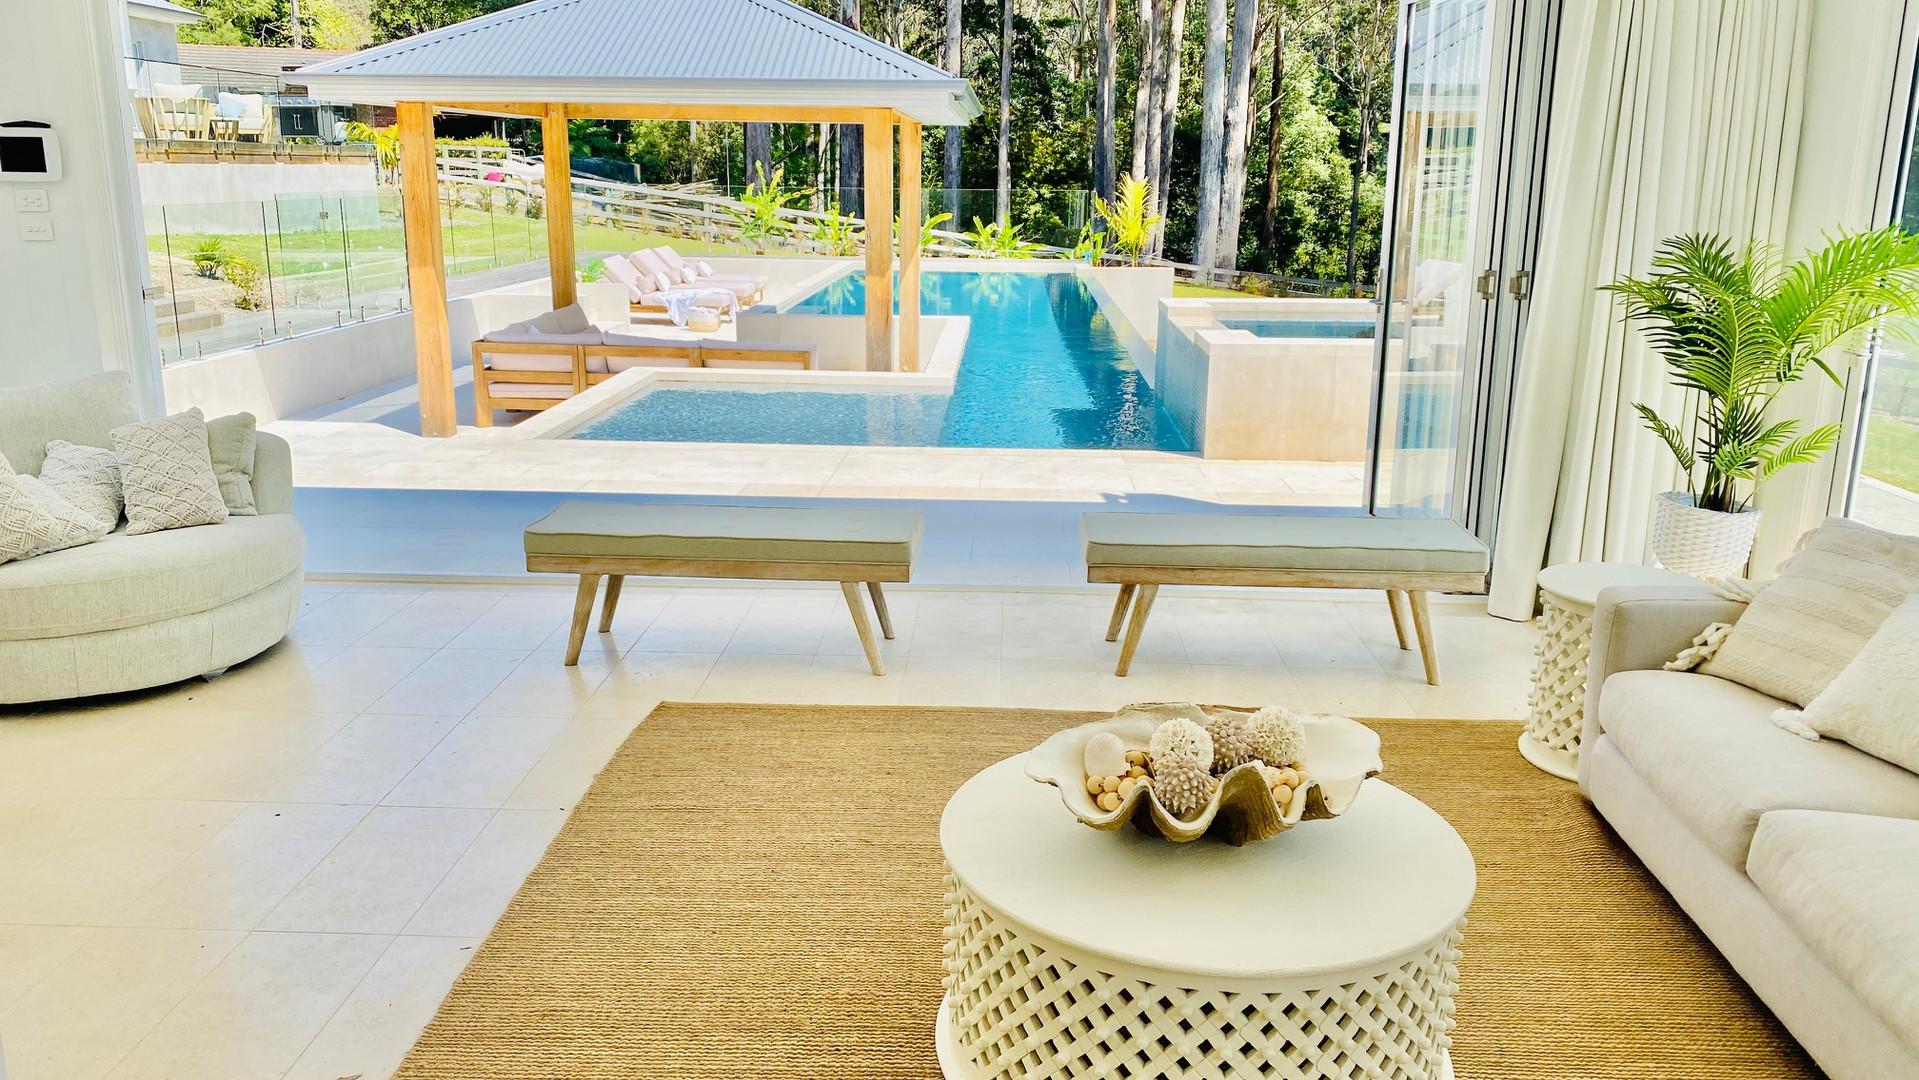 MacMasters Beach - Coastal style pool cabana